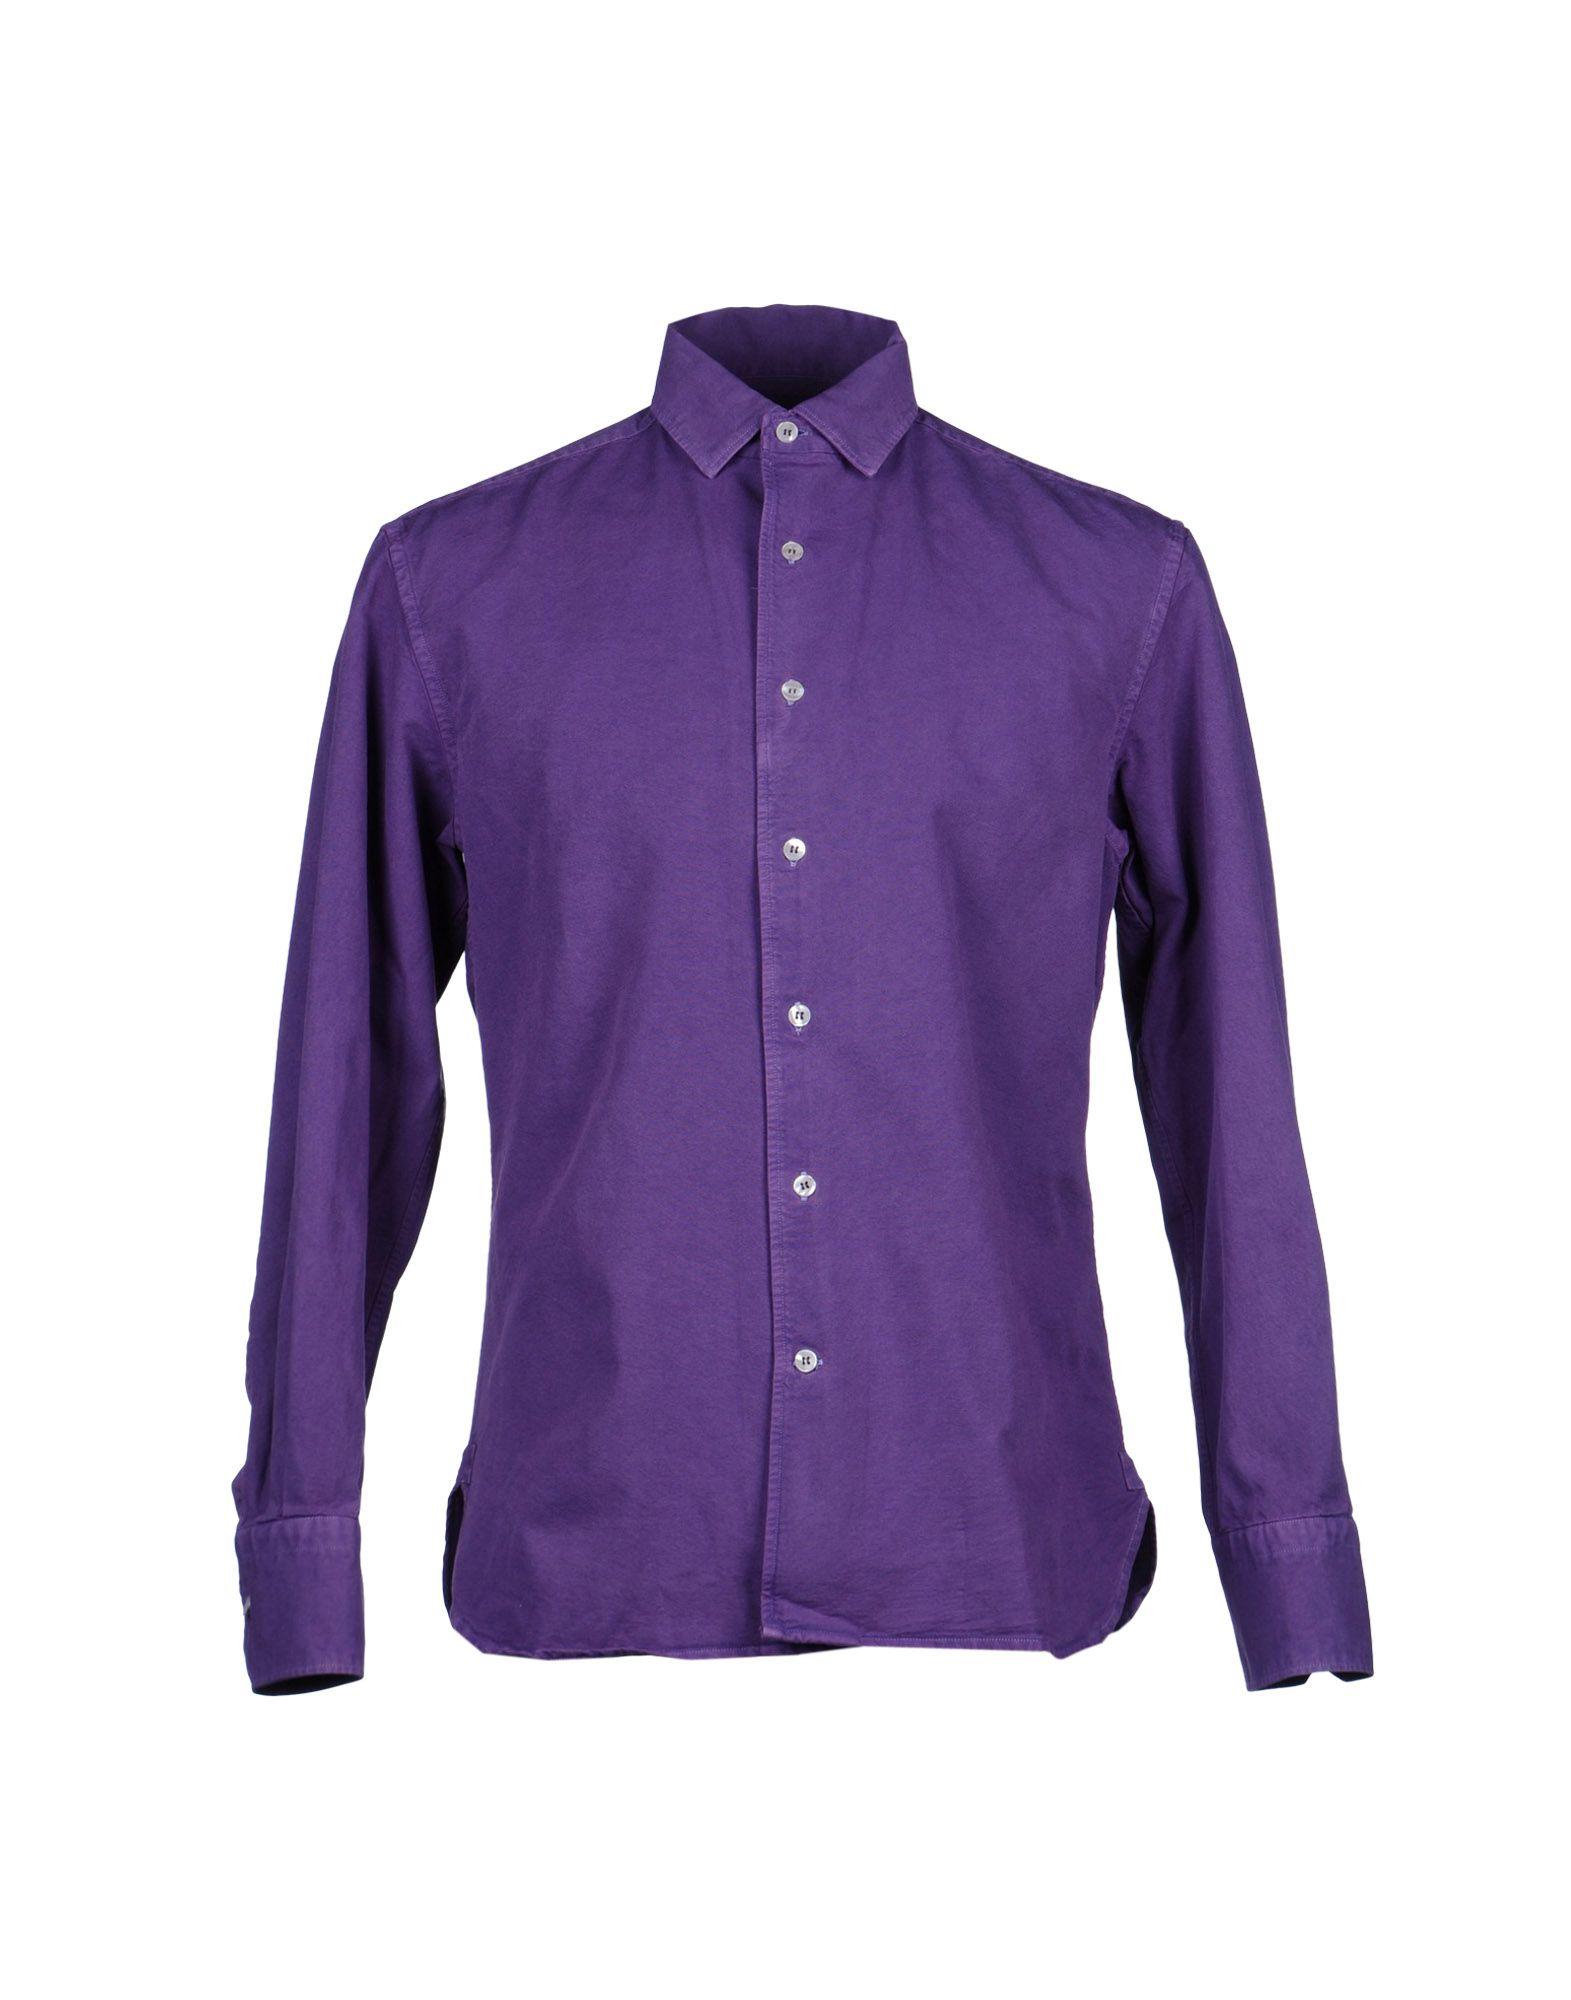 Alain Shirt In Purple For Men Lyst